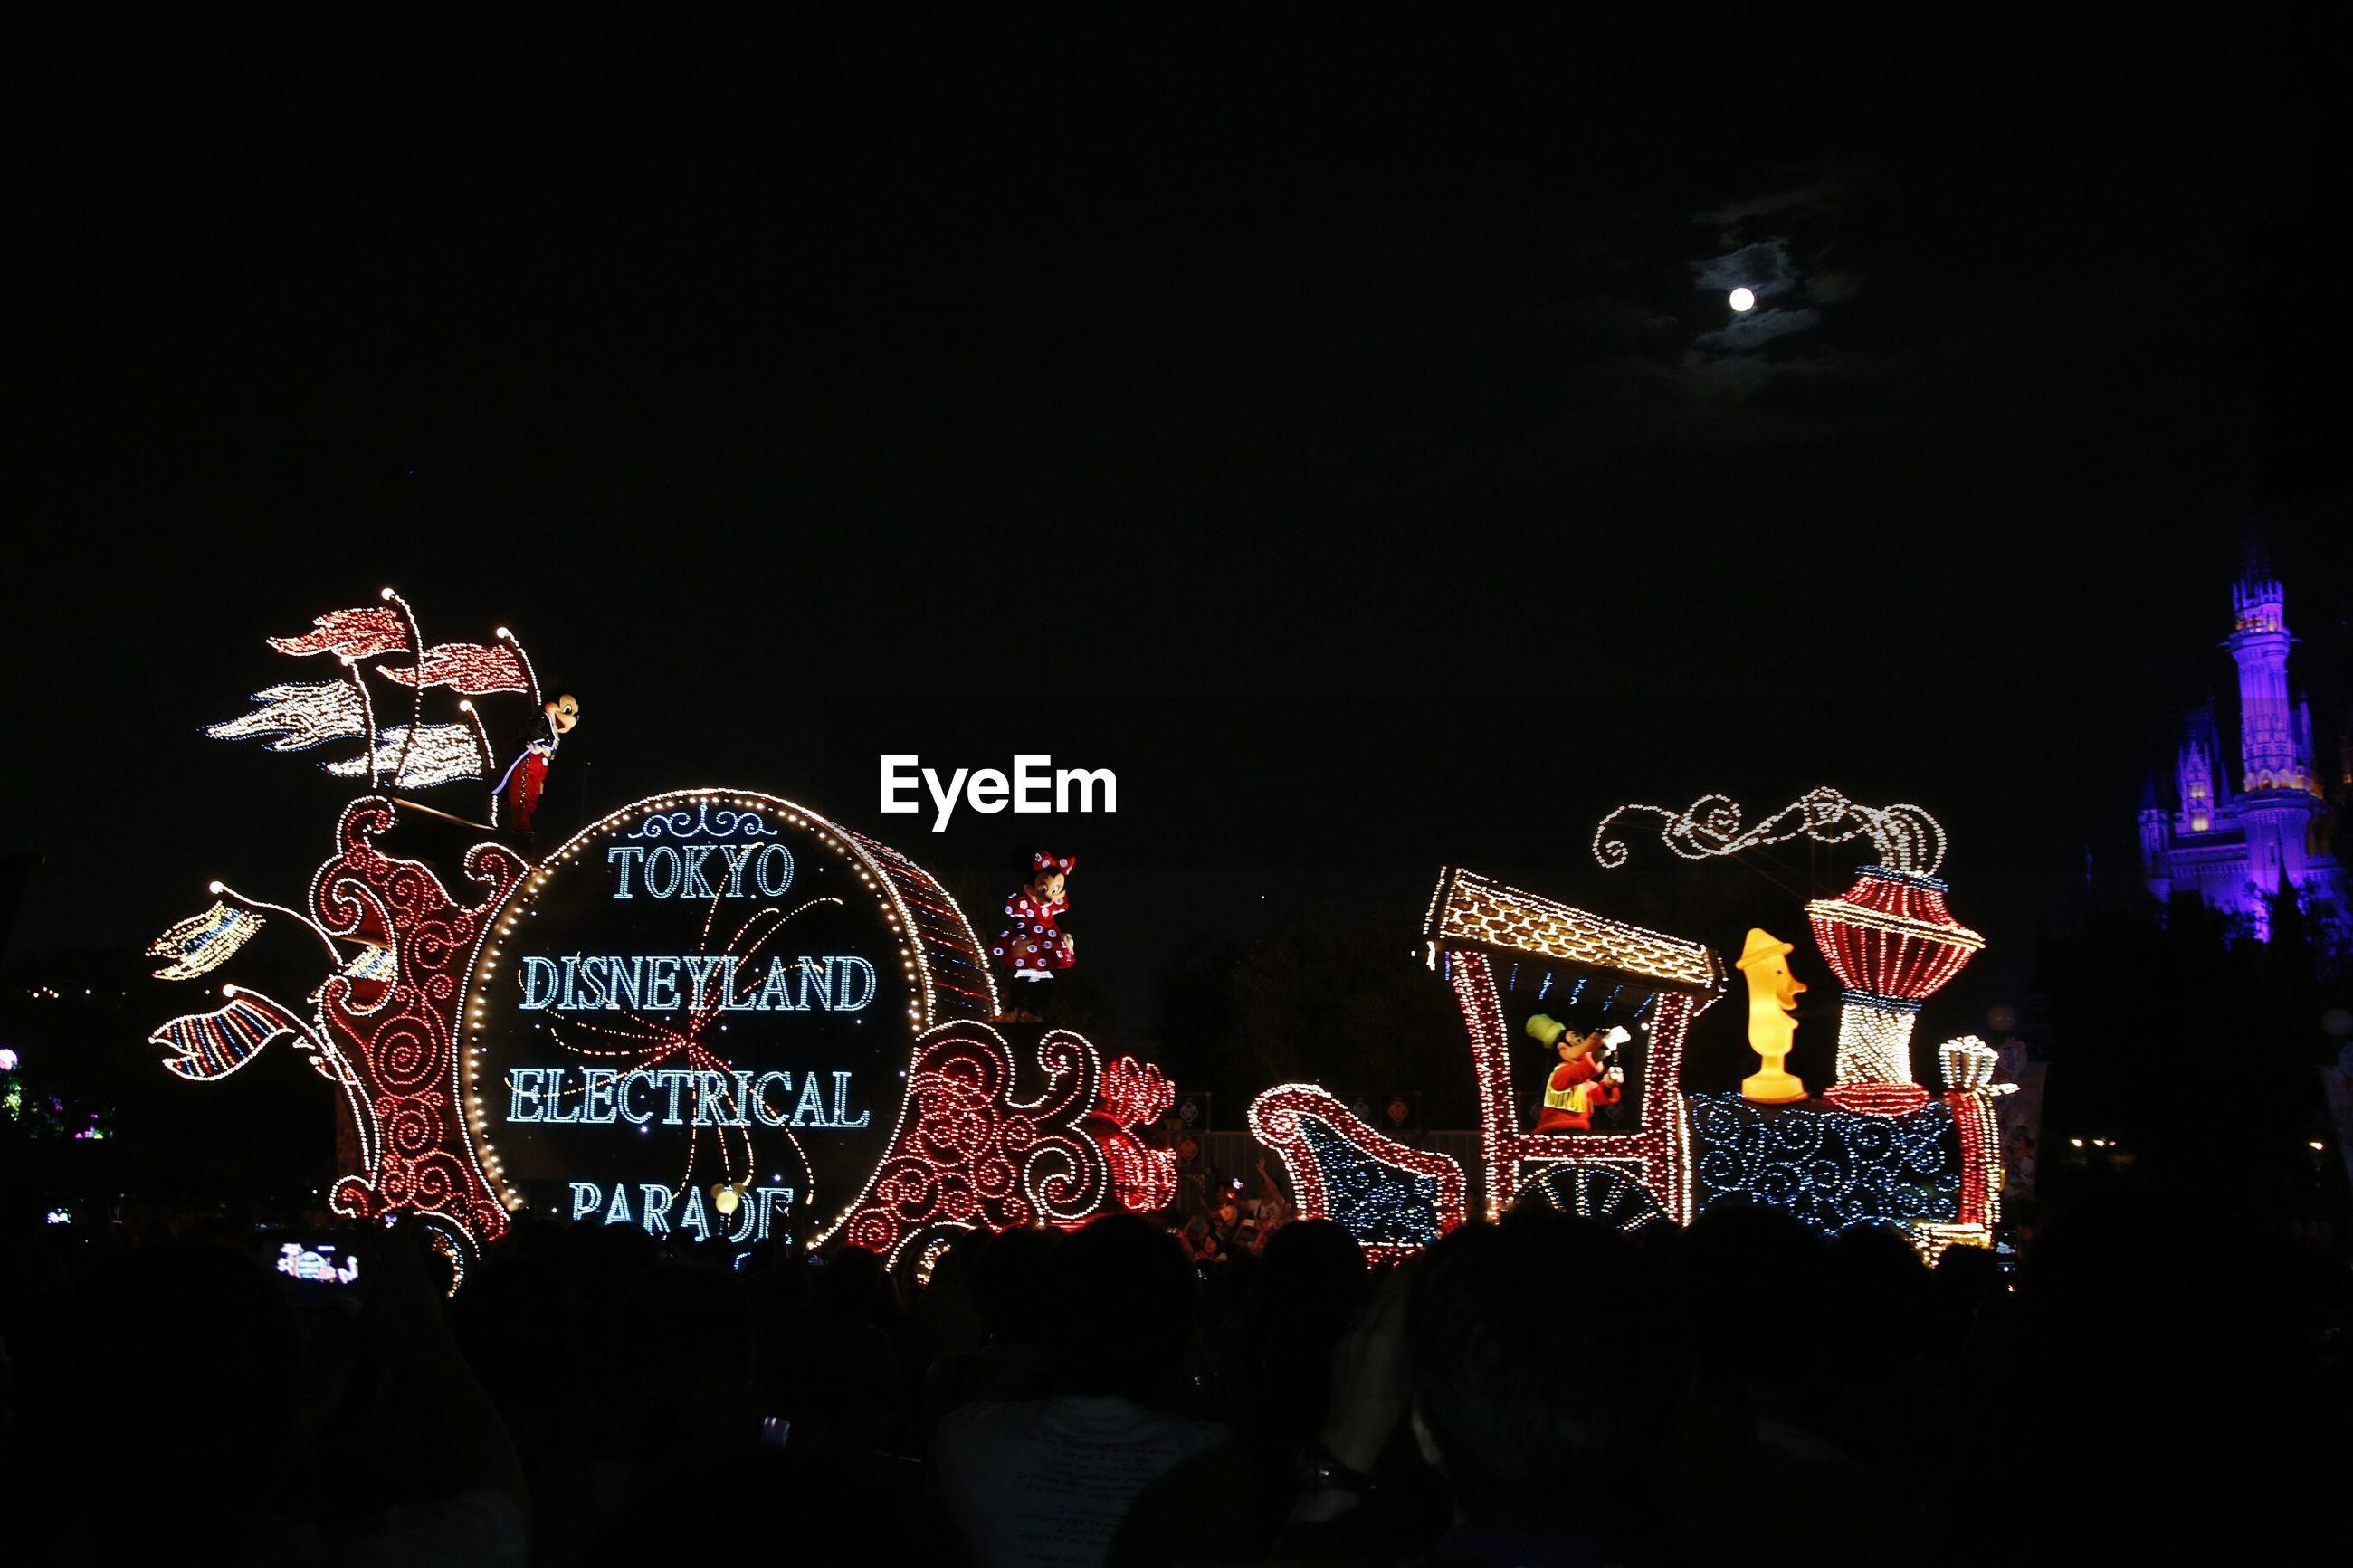 ILLUMINATED FERRIS WHEEL AT NIGHT DURING FESTIVAL